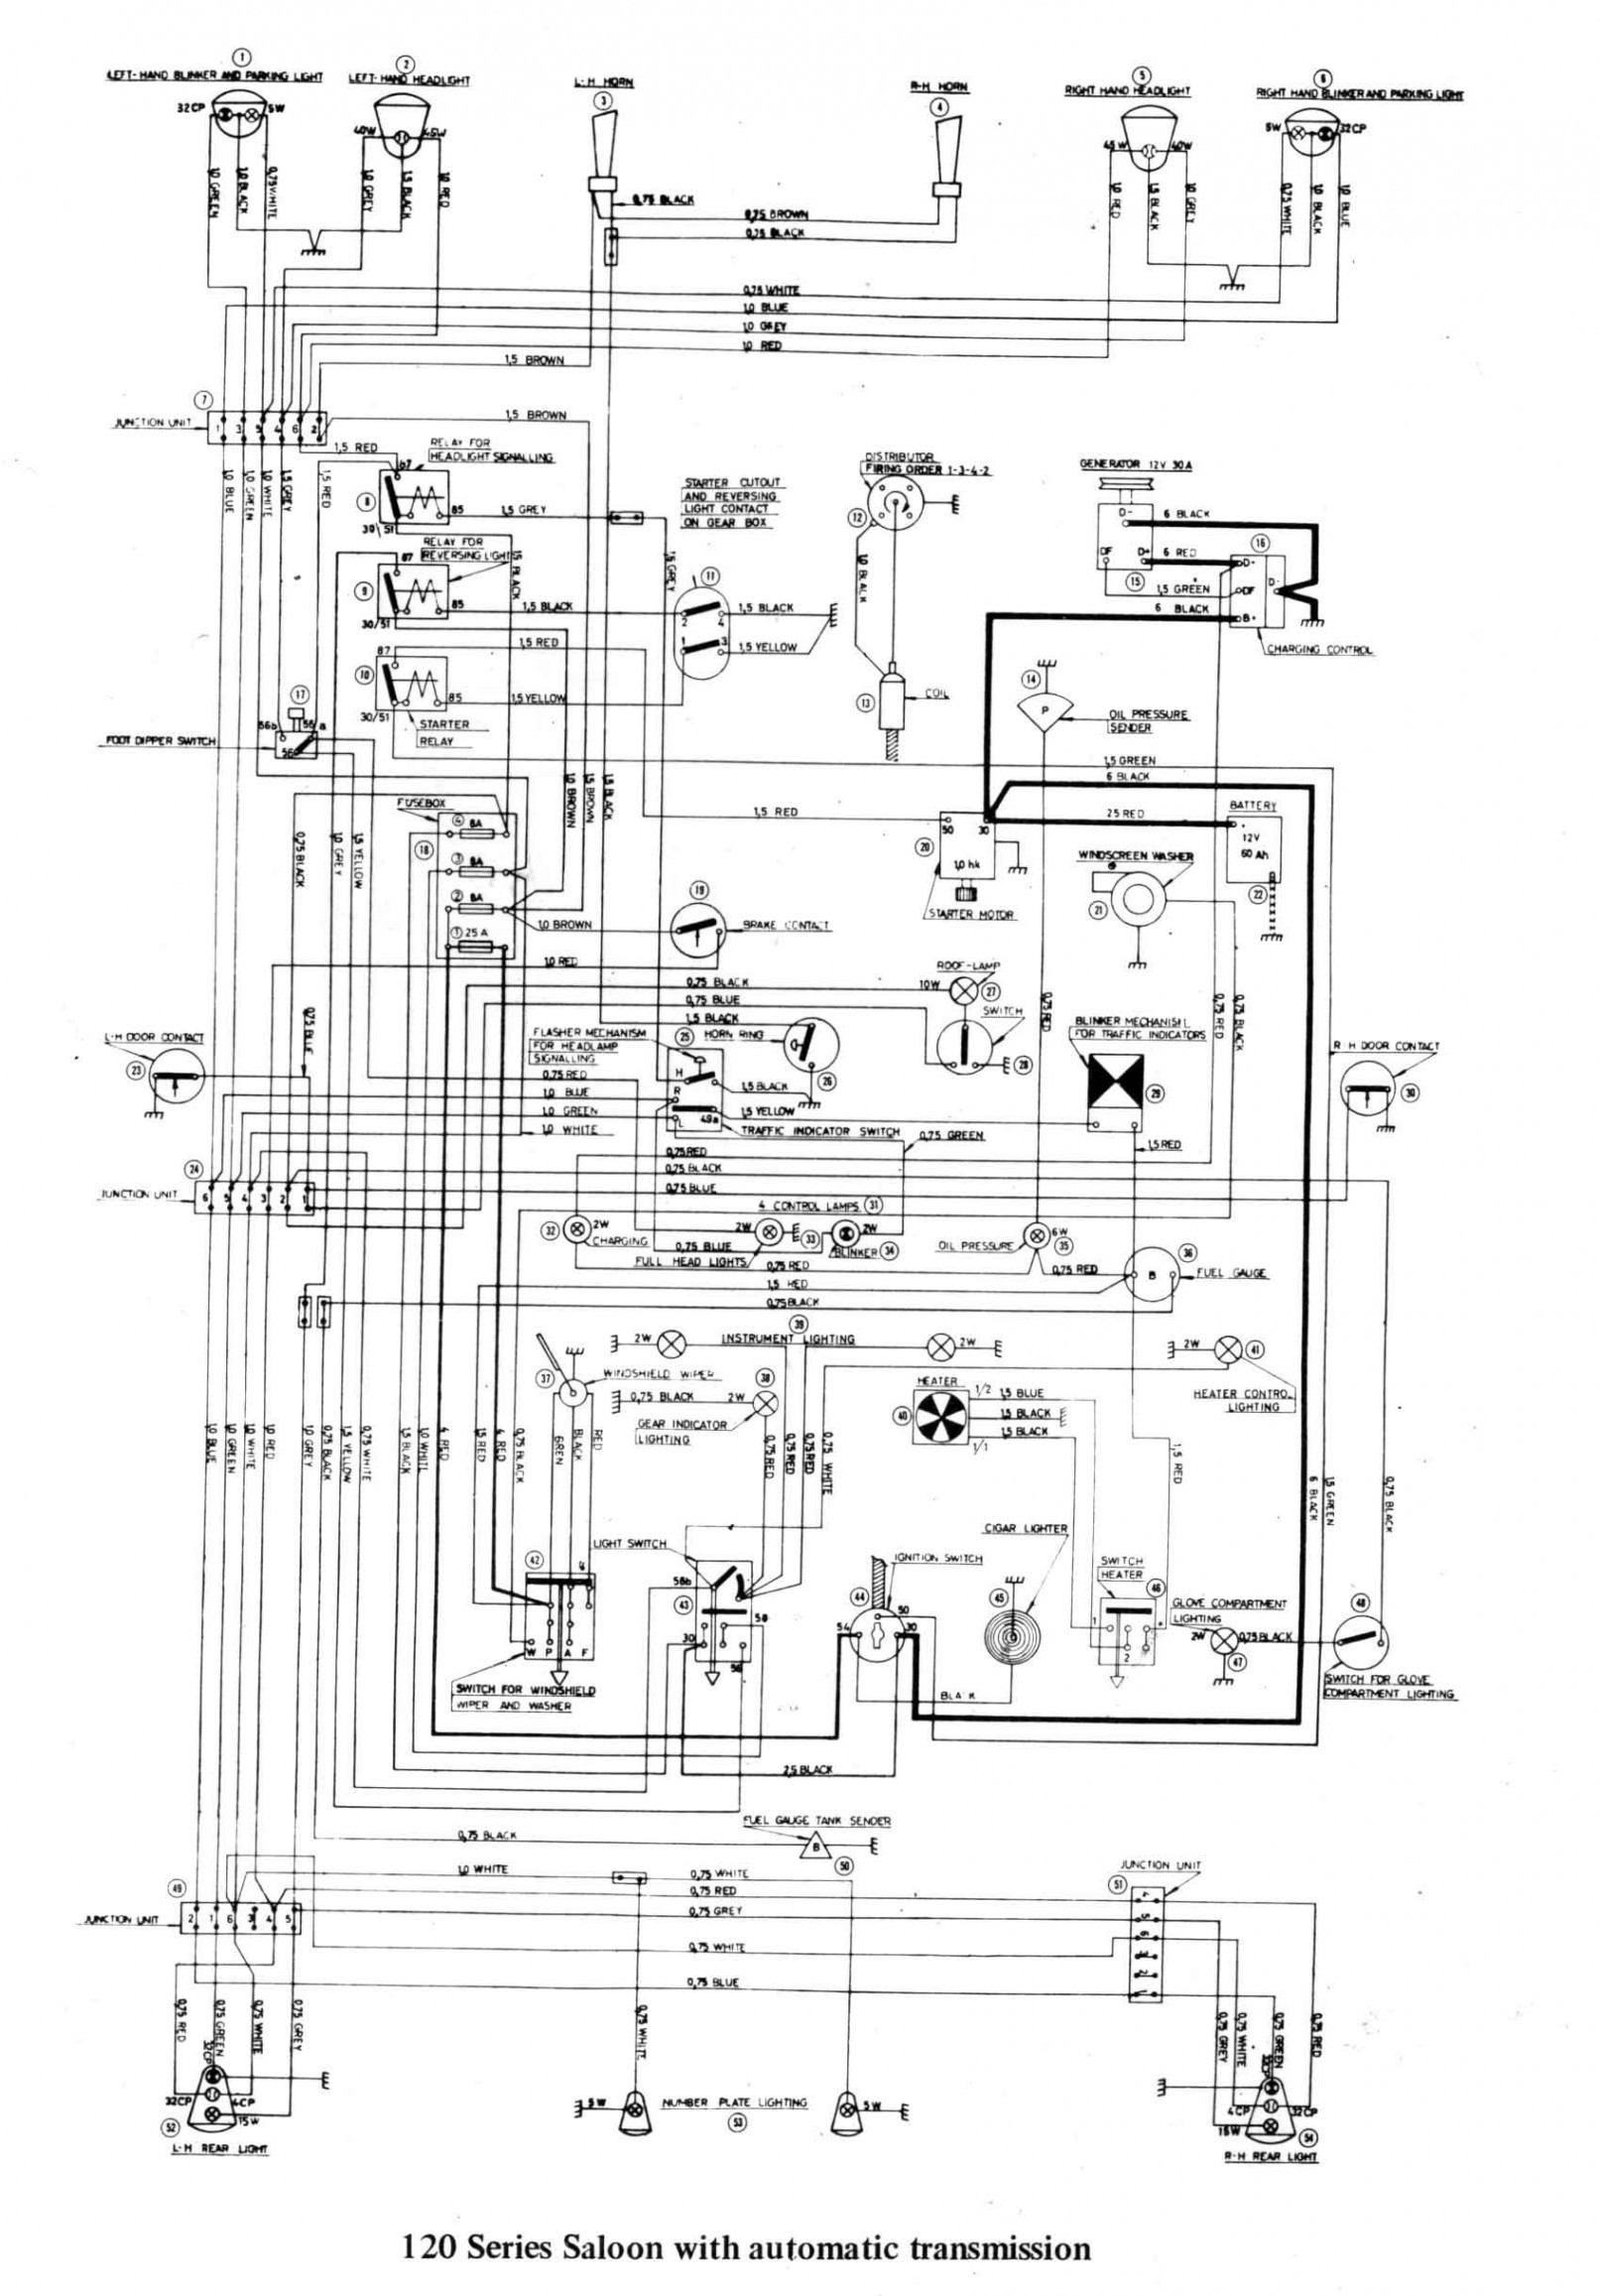 Autozone Wiring Diagram New Sw Em Od Retrofitting Vintage Volvo Refer Wiring Diagram 122s Showy